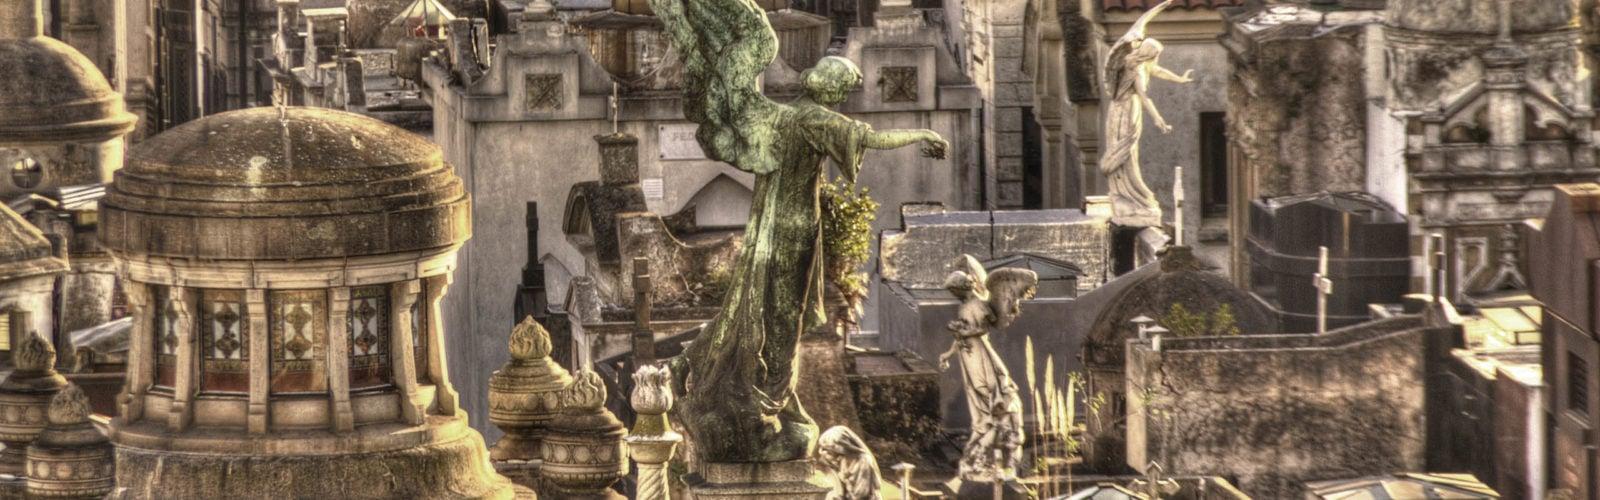 recoleta-cemetery-buenos-aires